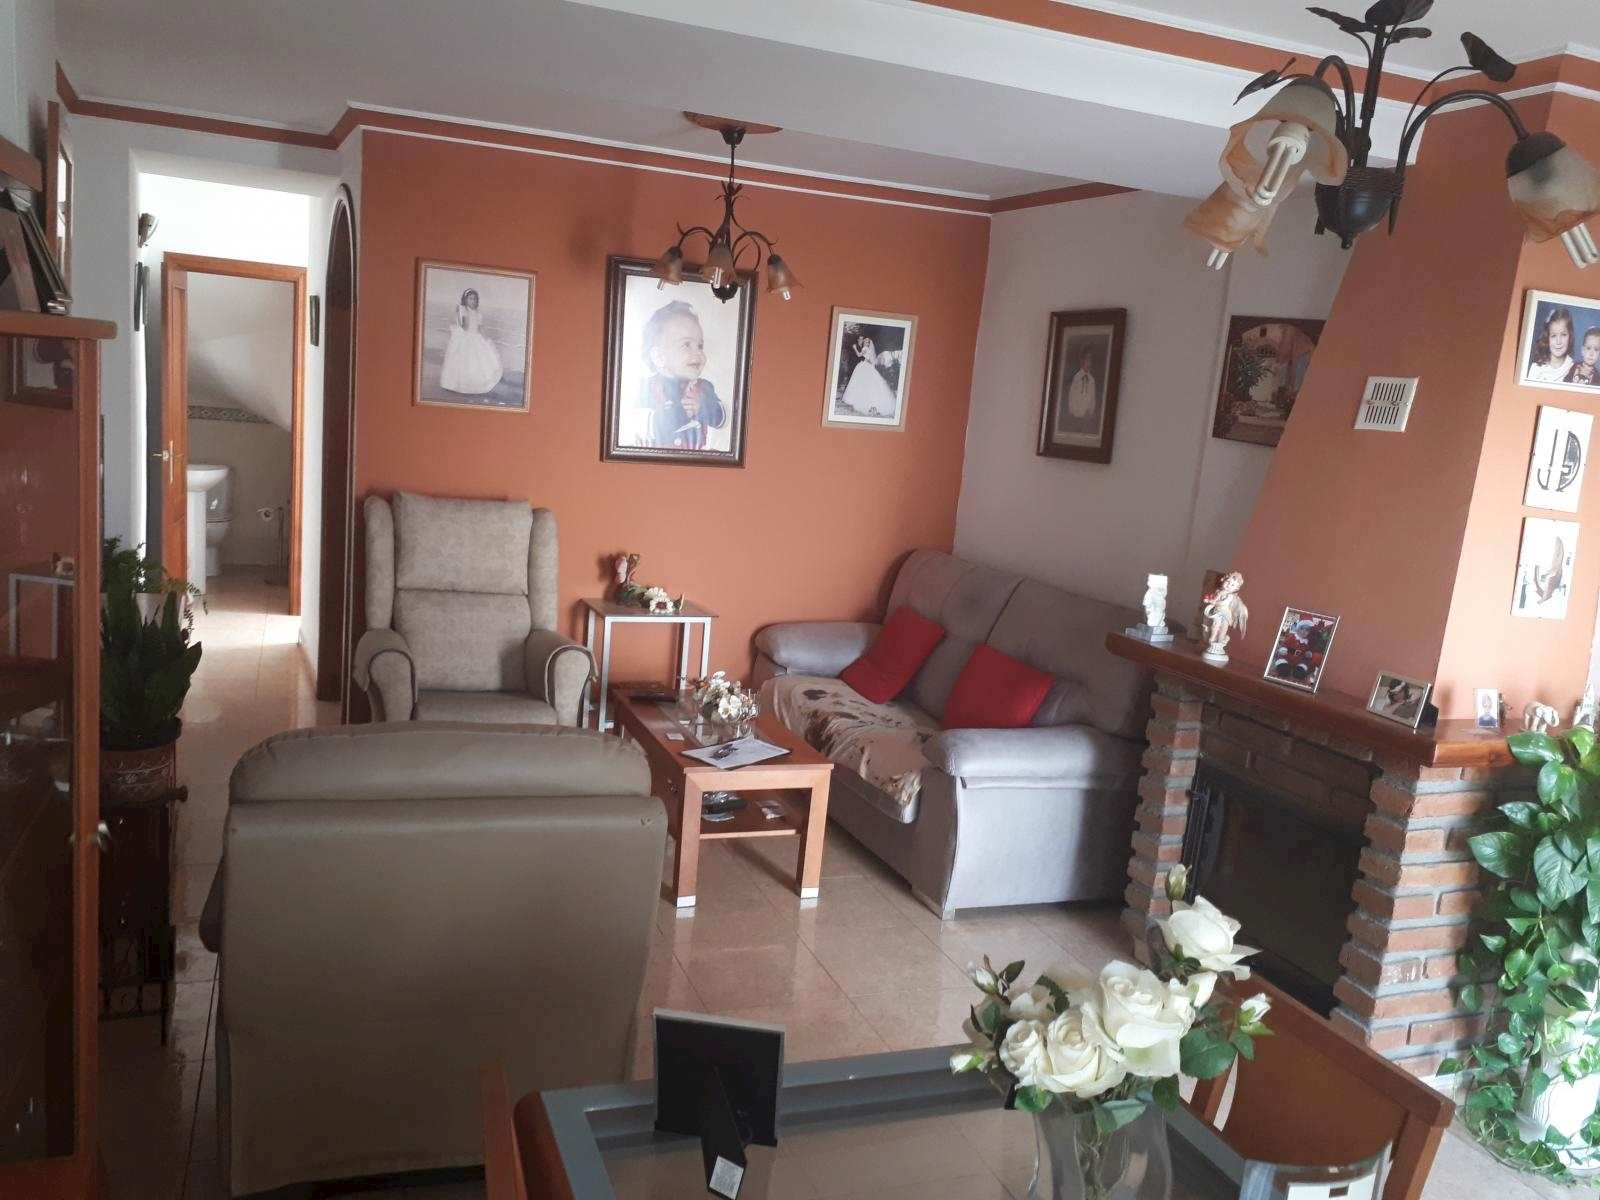 2 bedroom Finca/Country House for sale in Nerja - € 176,000 (Ref: 3768090)